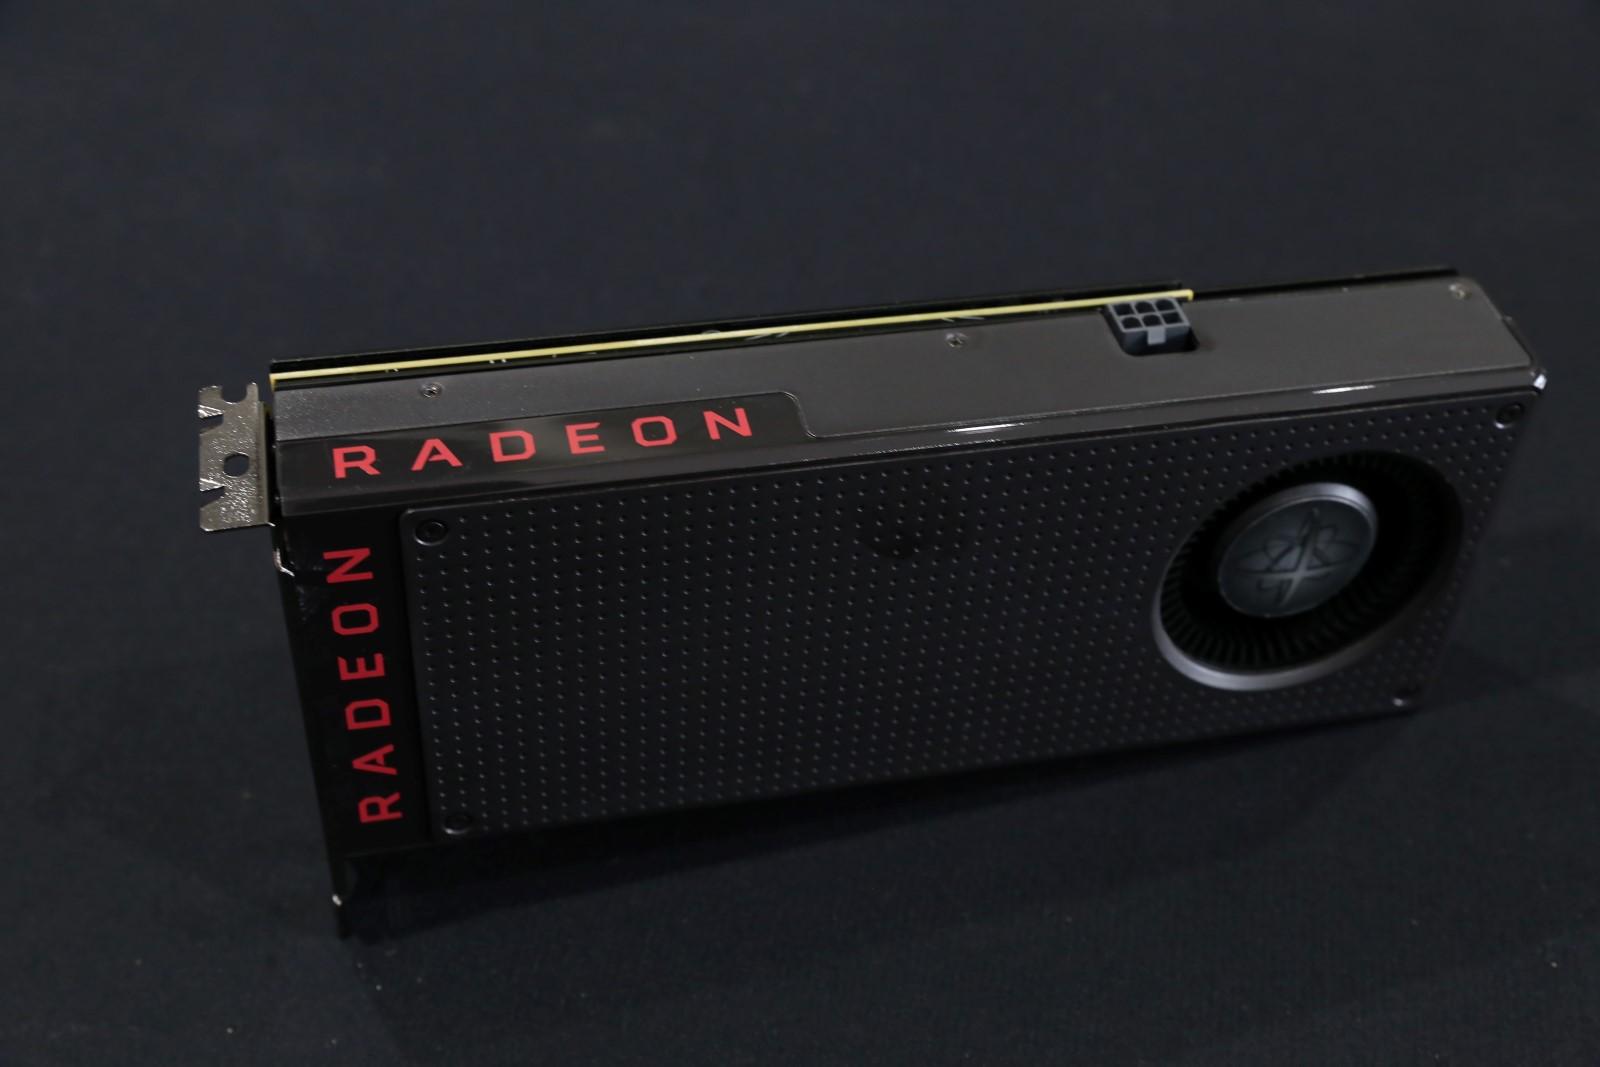 XFX RX480 Black Edition 8GB | XFX RX 480 Black Edition 8GB